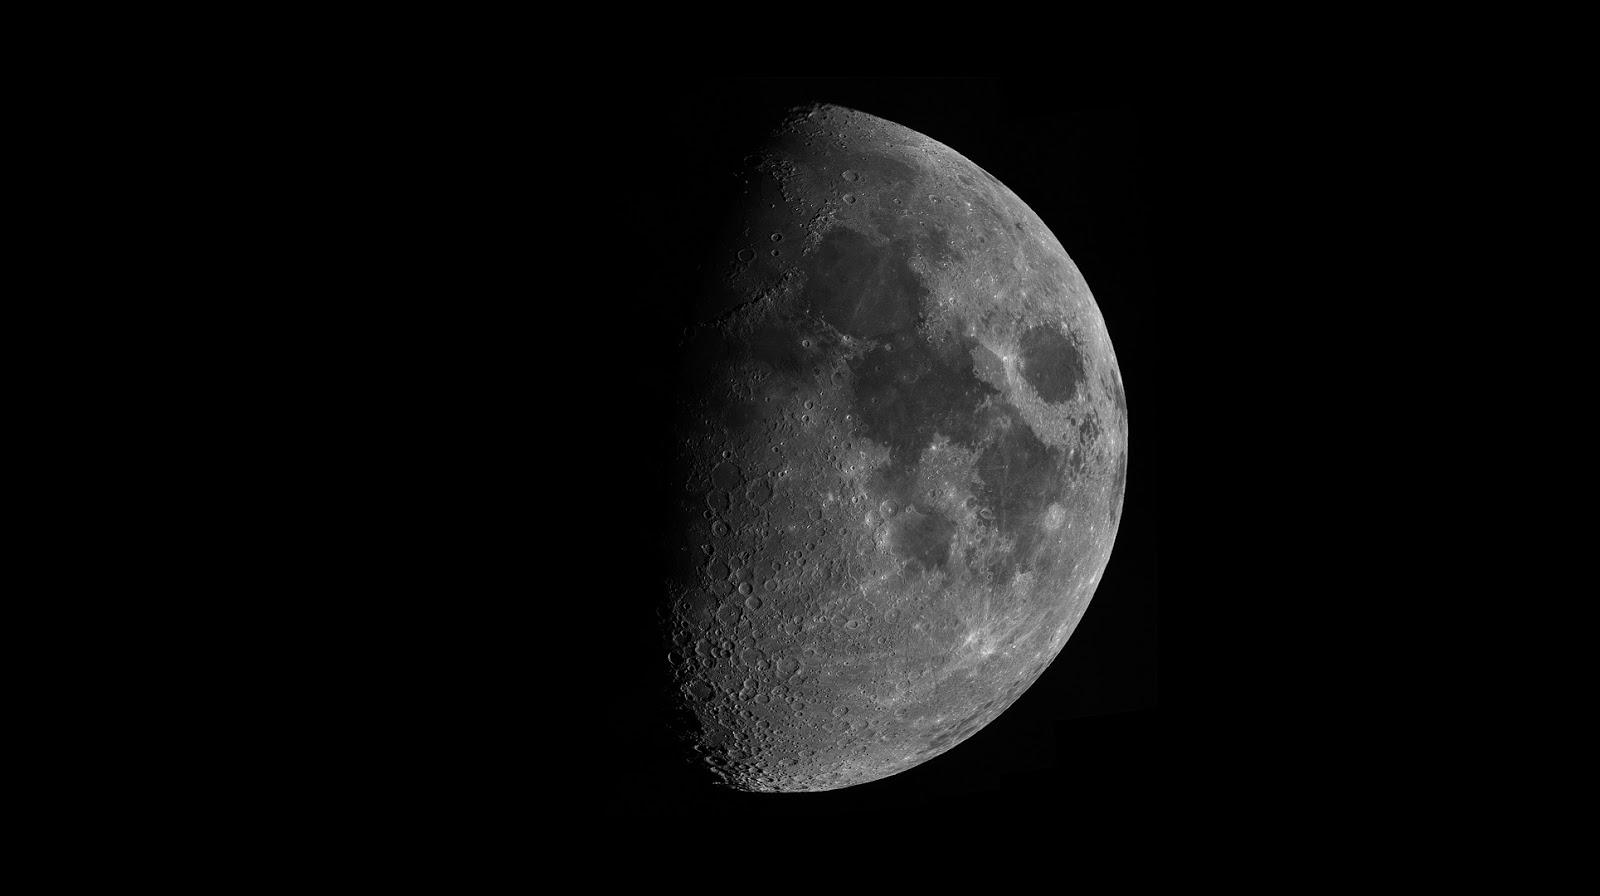 Short Circuits And Infinite Loops 4k Wallpaper Partial Moon